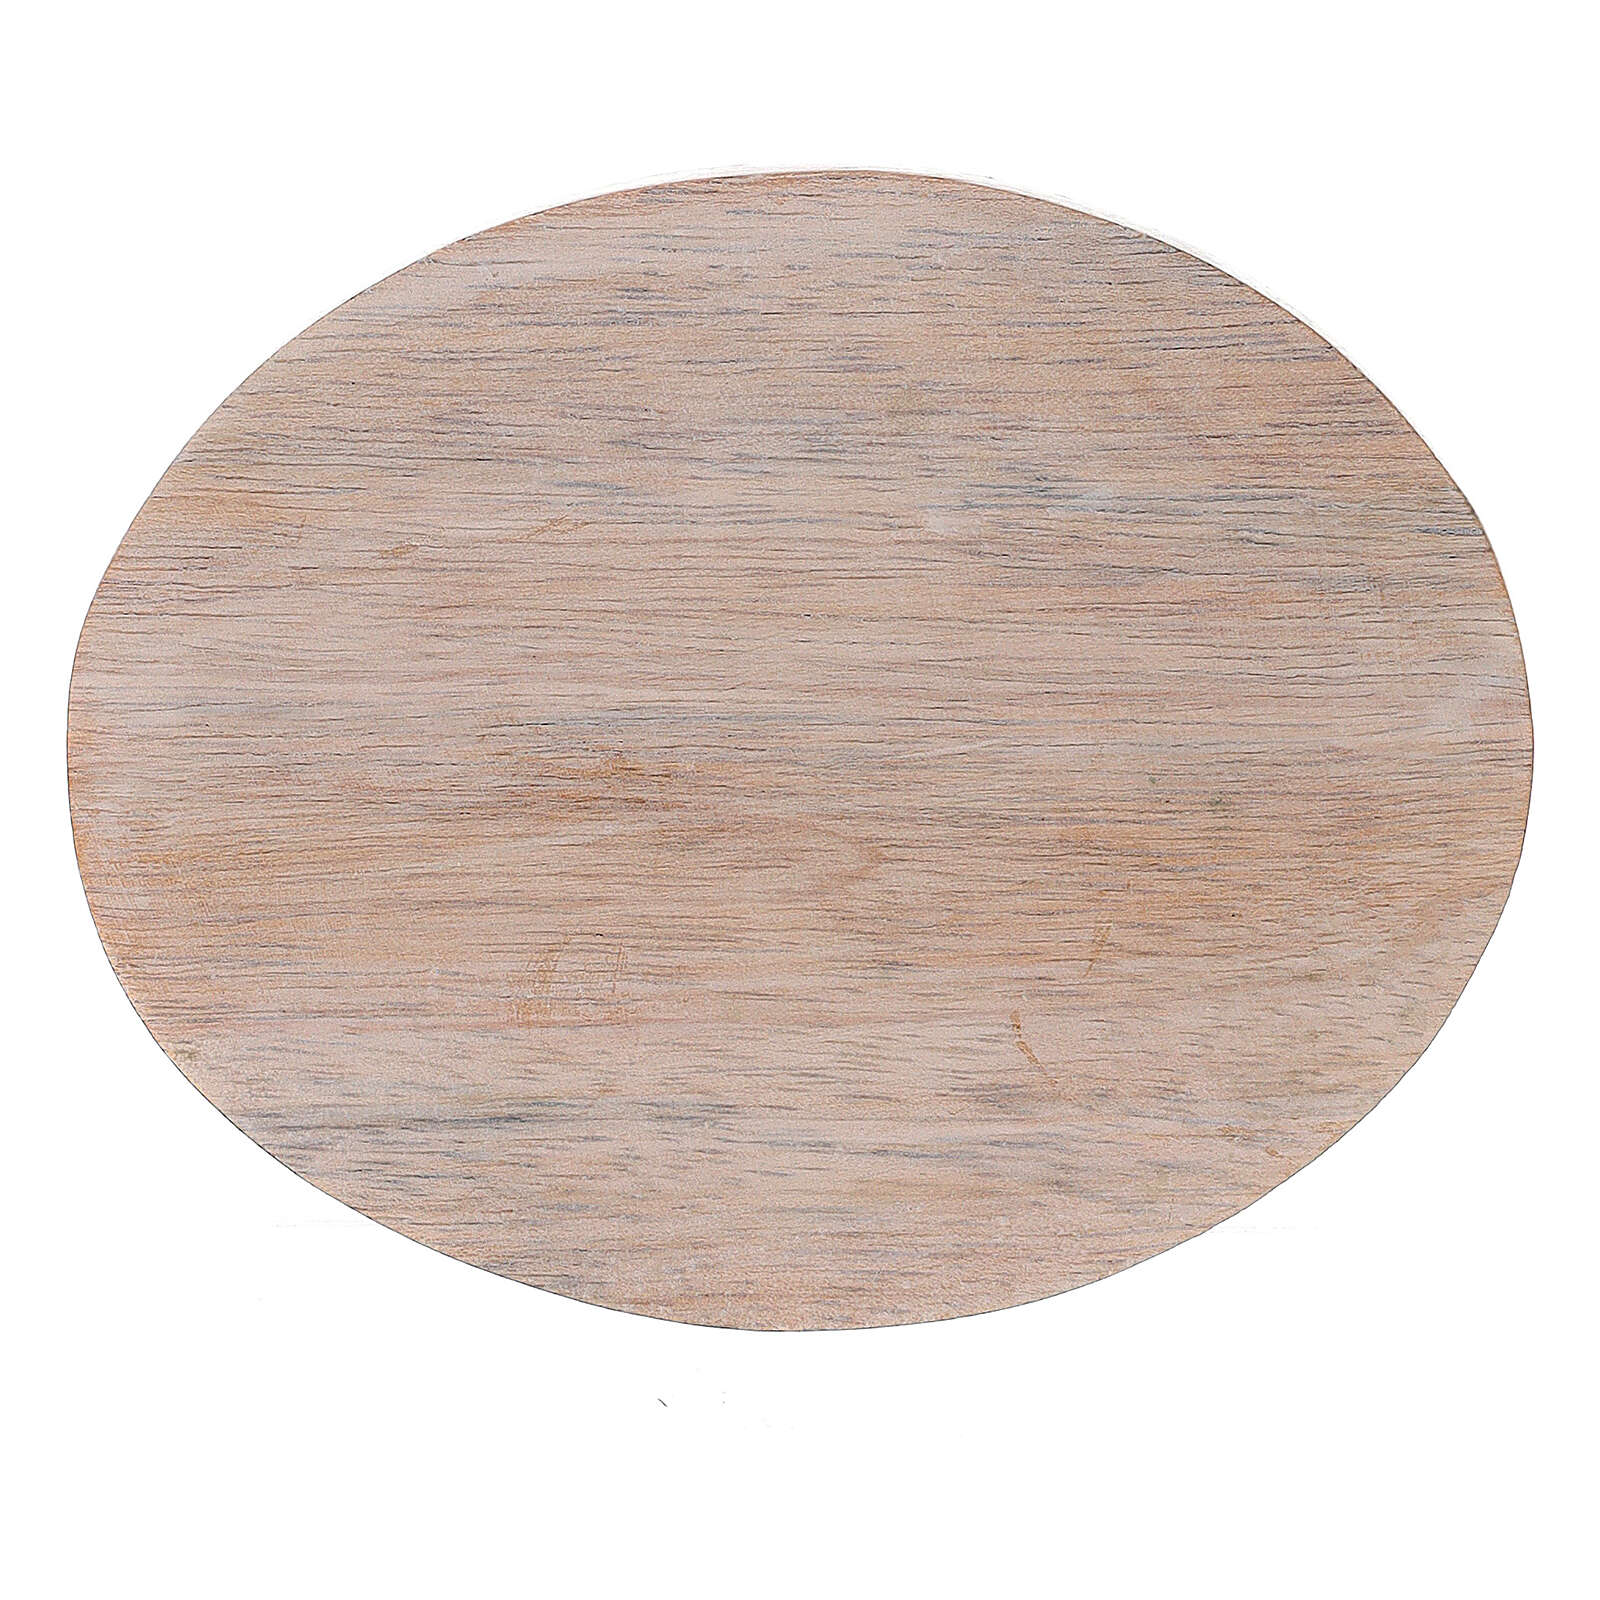 Plato portavela madera de mango claro 10x8 cm 3